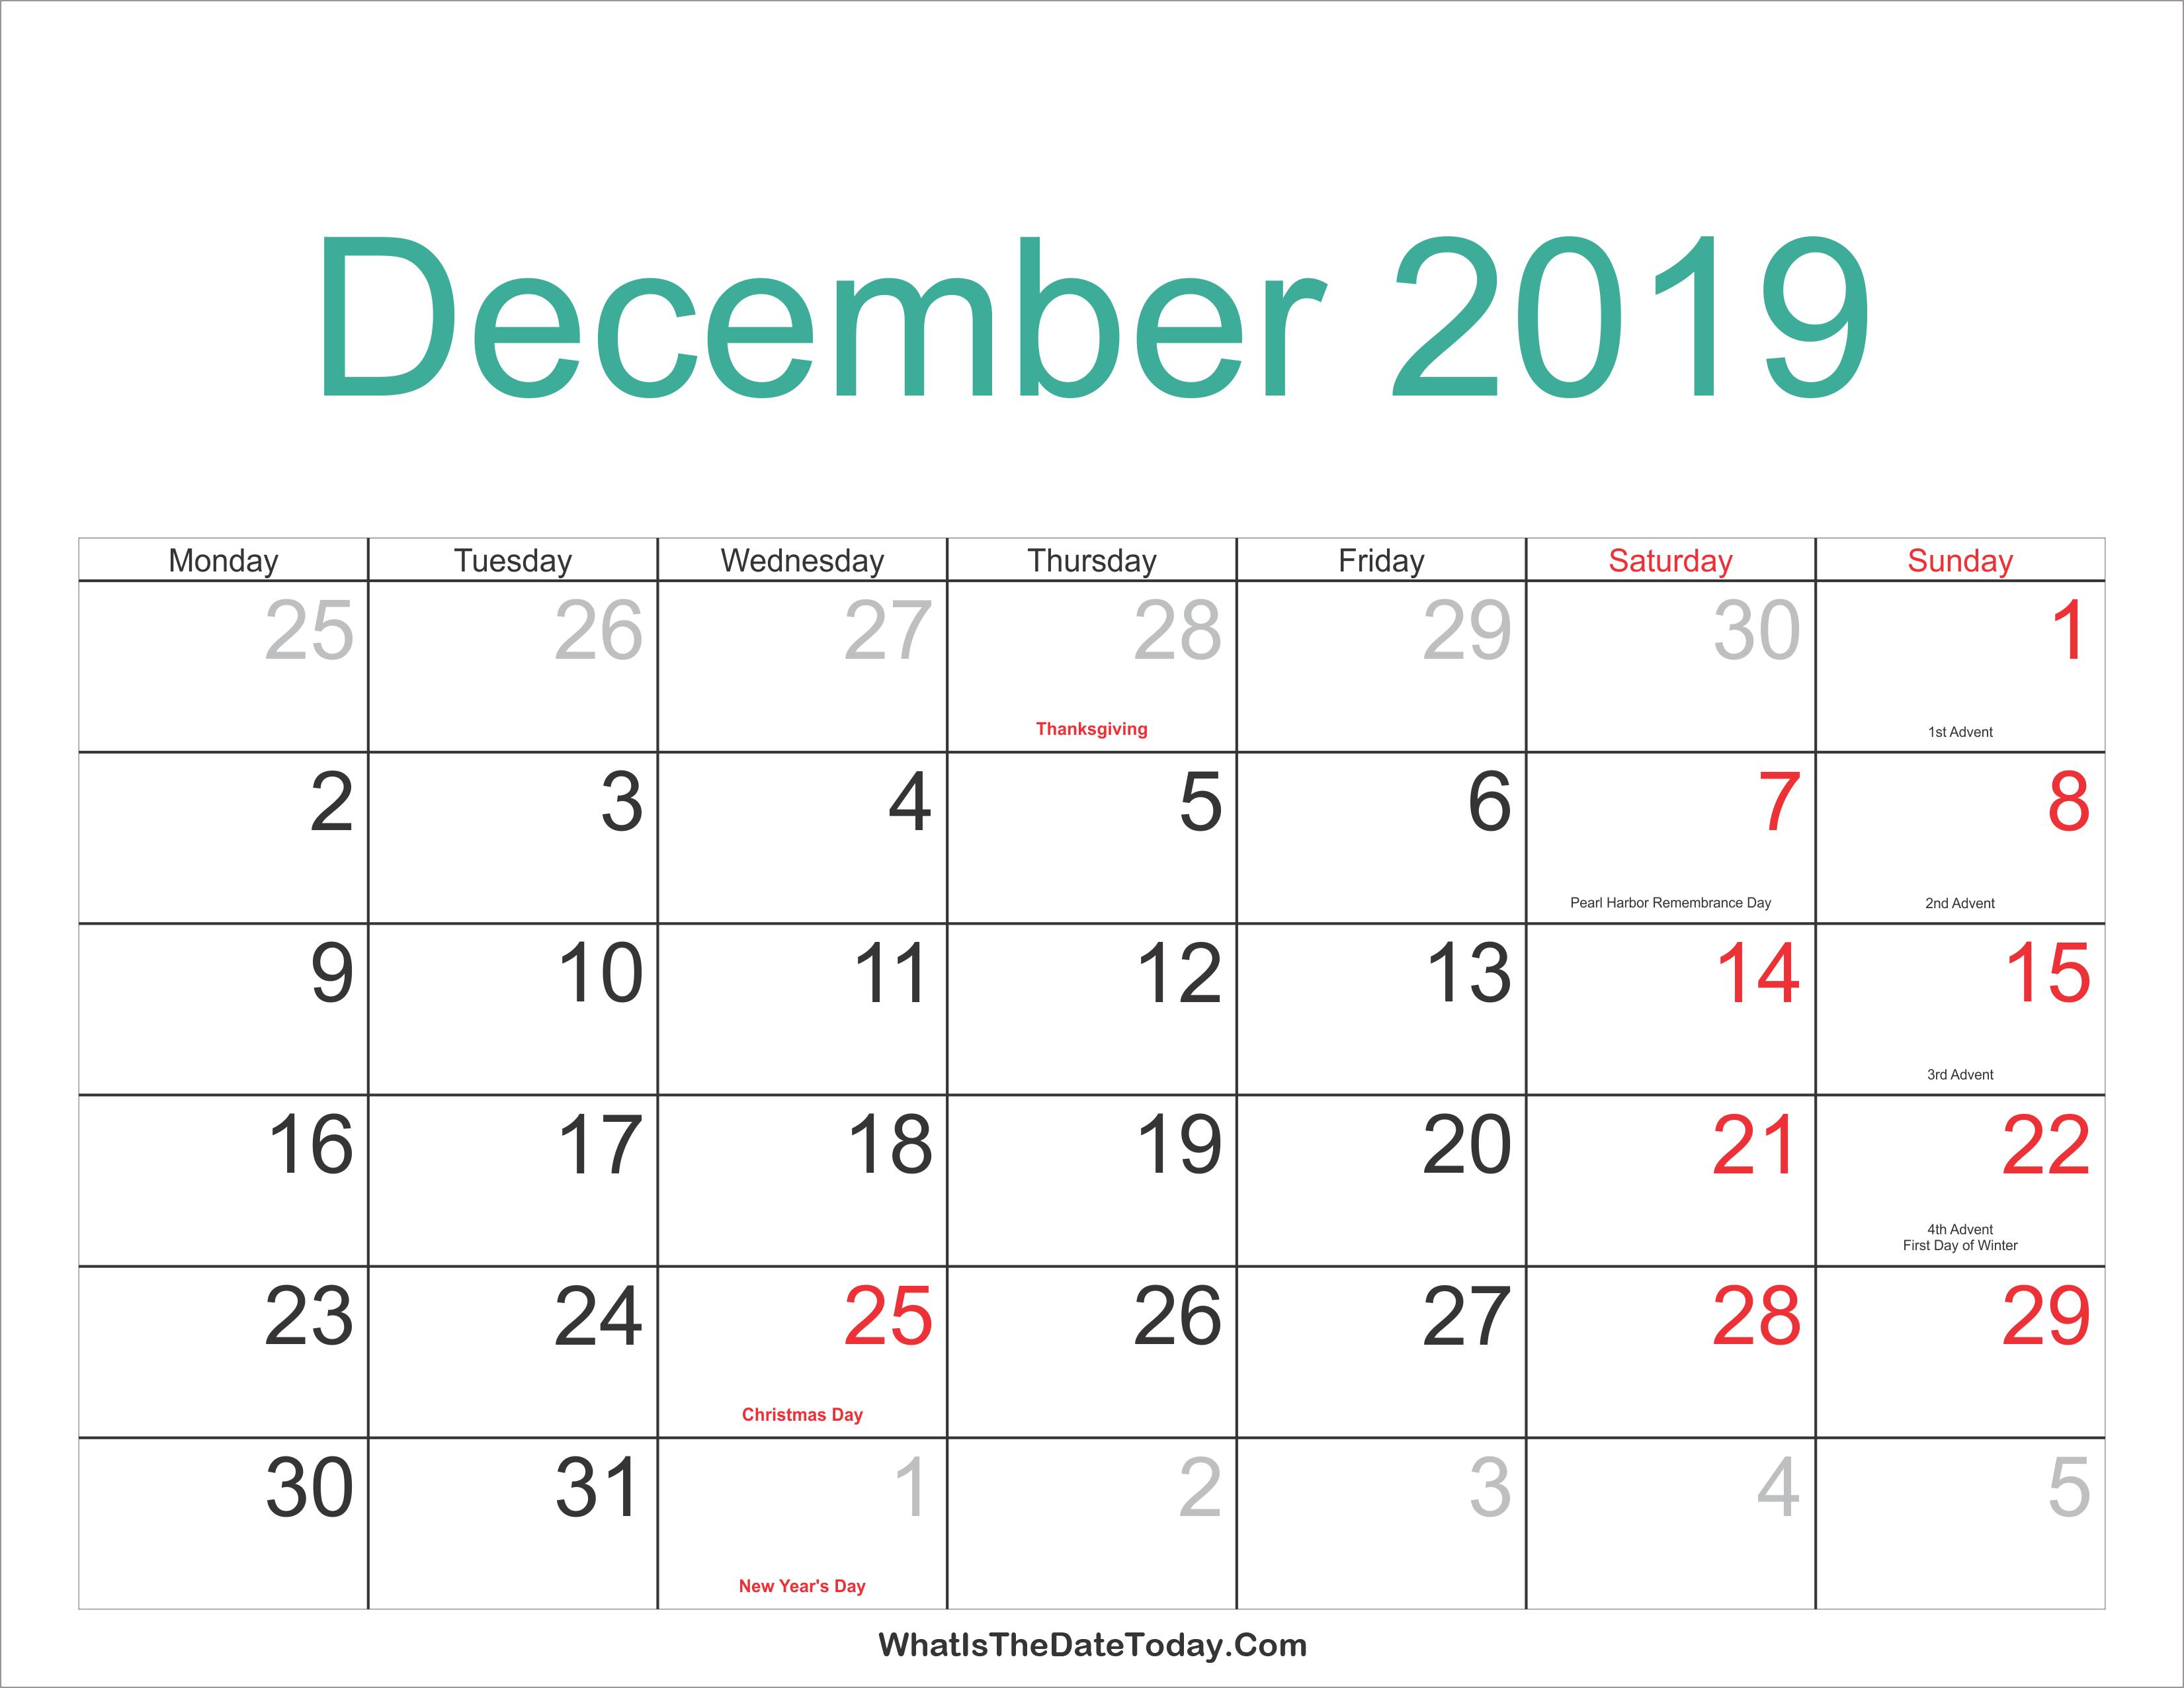 December 2019 Calendar With Holidays Dec December December2019 December2019calendar 2019cale Holiday Calendar Printable February Calendar January Calendar